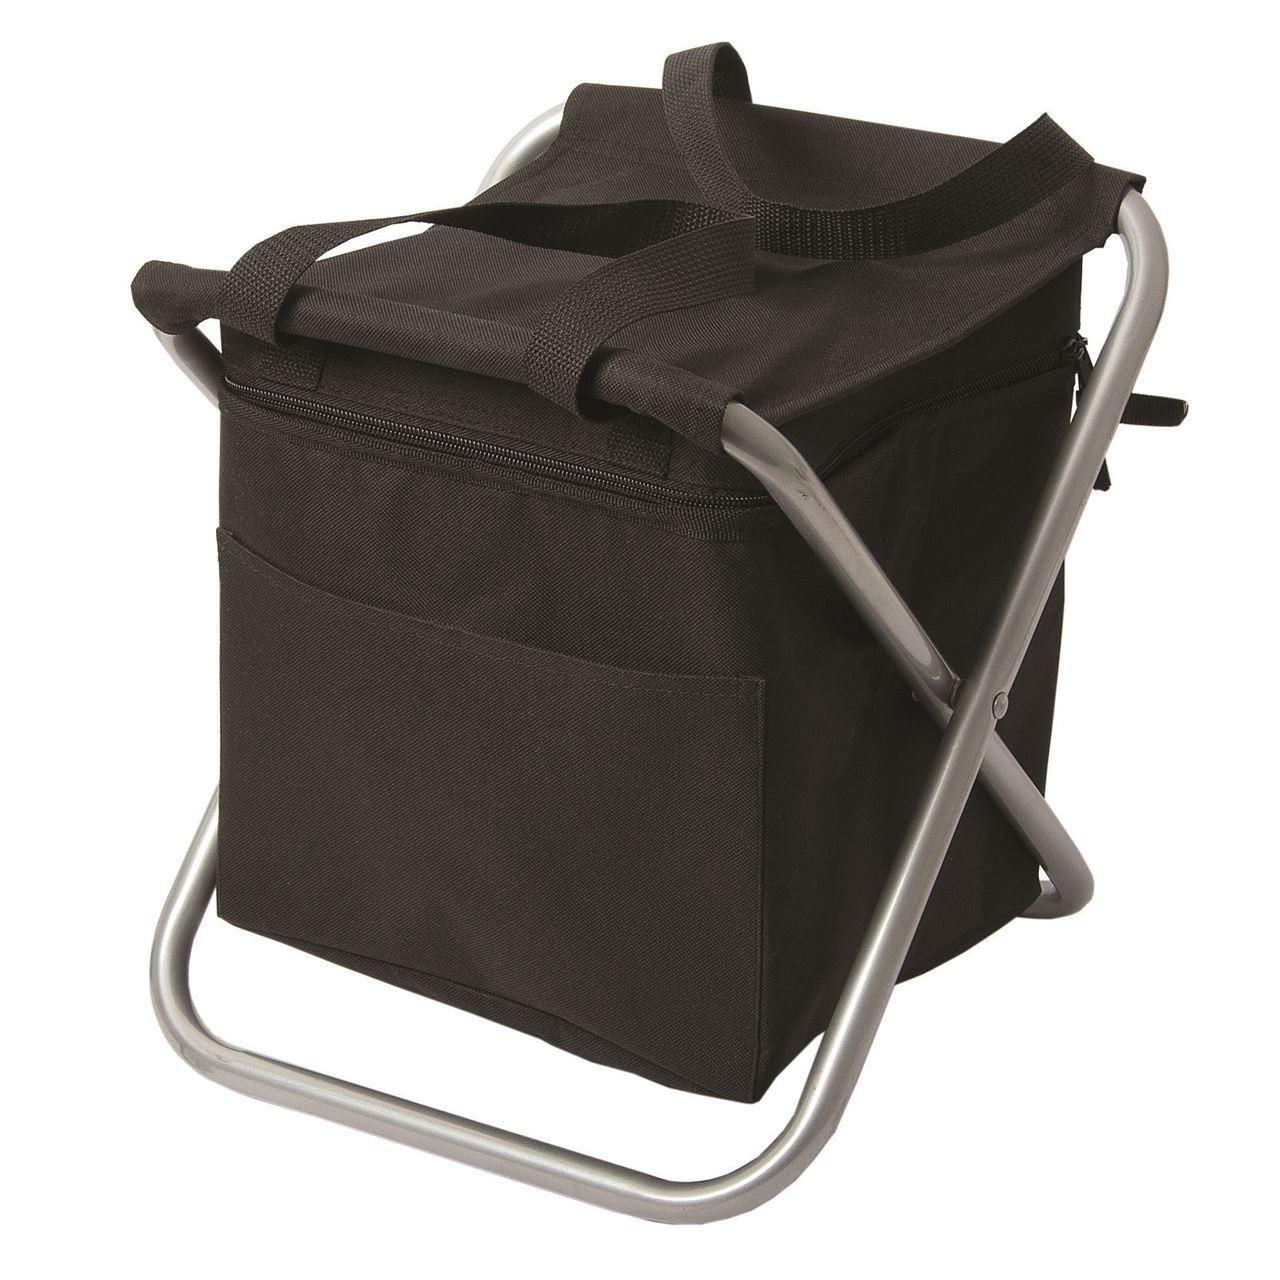 stash saver cooler chair bags custom promo item entripy